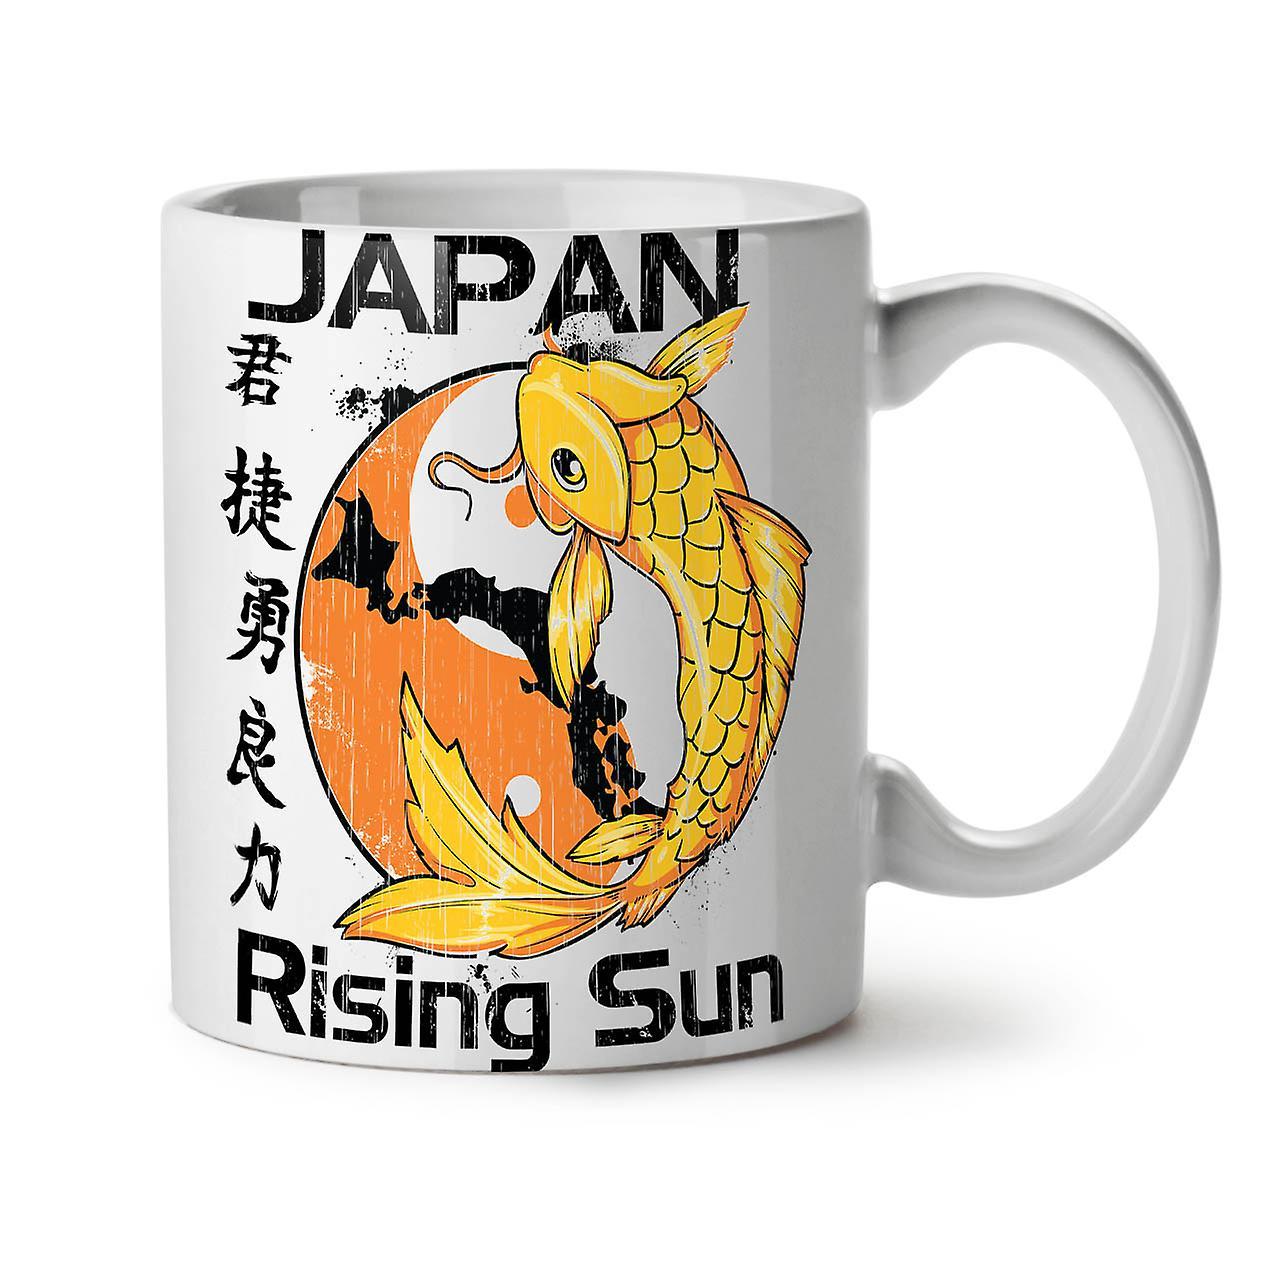 Rising Sun Thé OzWellcoda Céramique 11 Blanc Nouveau Koi Japon Café Tasse xoerWEdBQC